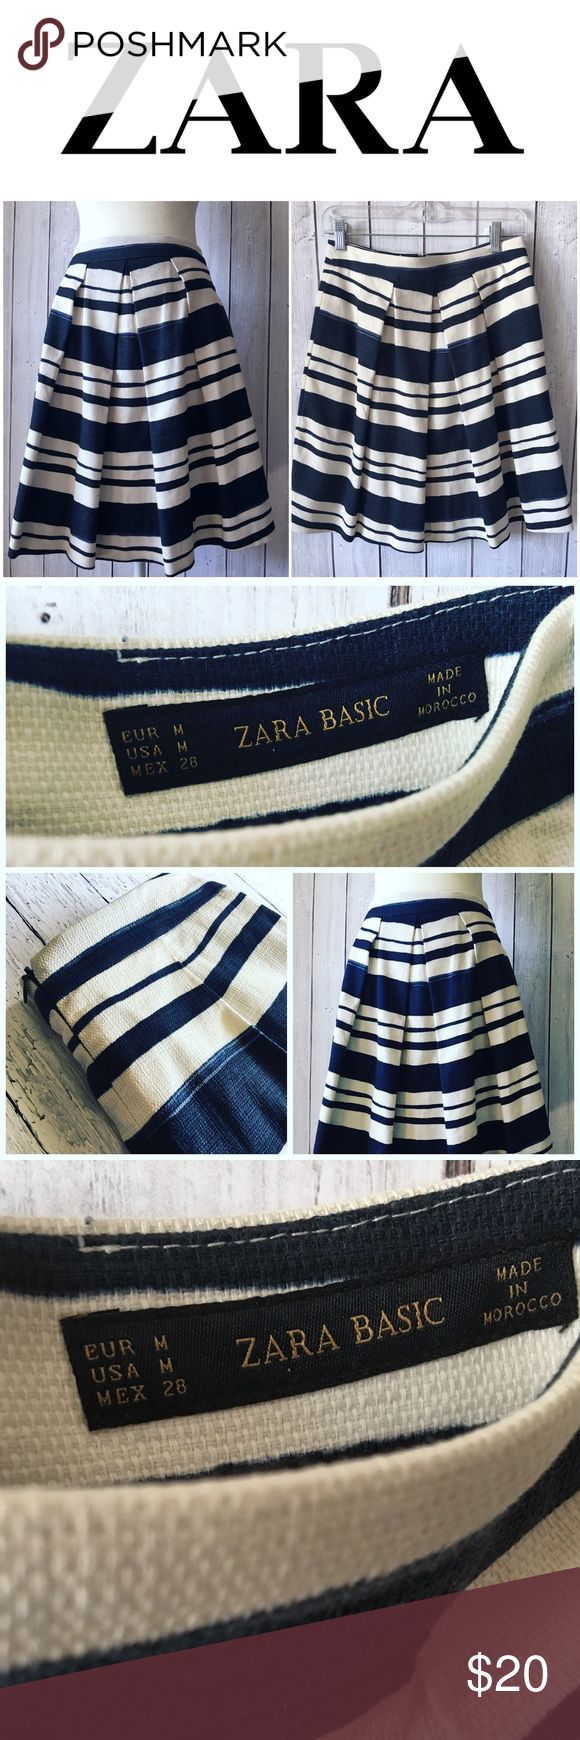 "ZARA basics navy striped skirt, zip back, cute! ZARA basics collection Navy Striped skirt, zip back, 21"" long, size medium, 14"" flat across waist. Excellent condition!👌🏼 Zara Skirts Midi"